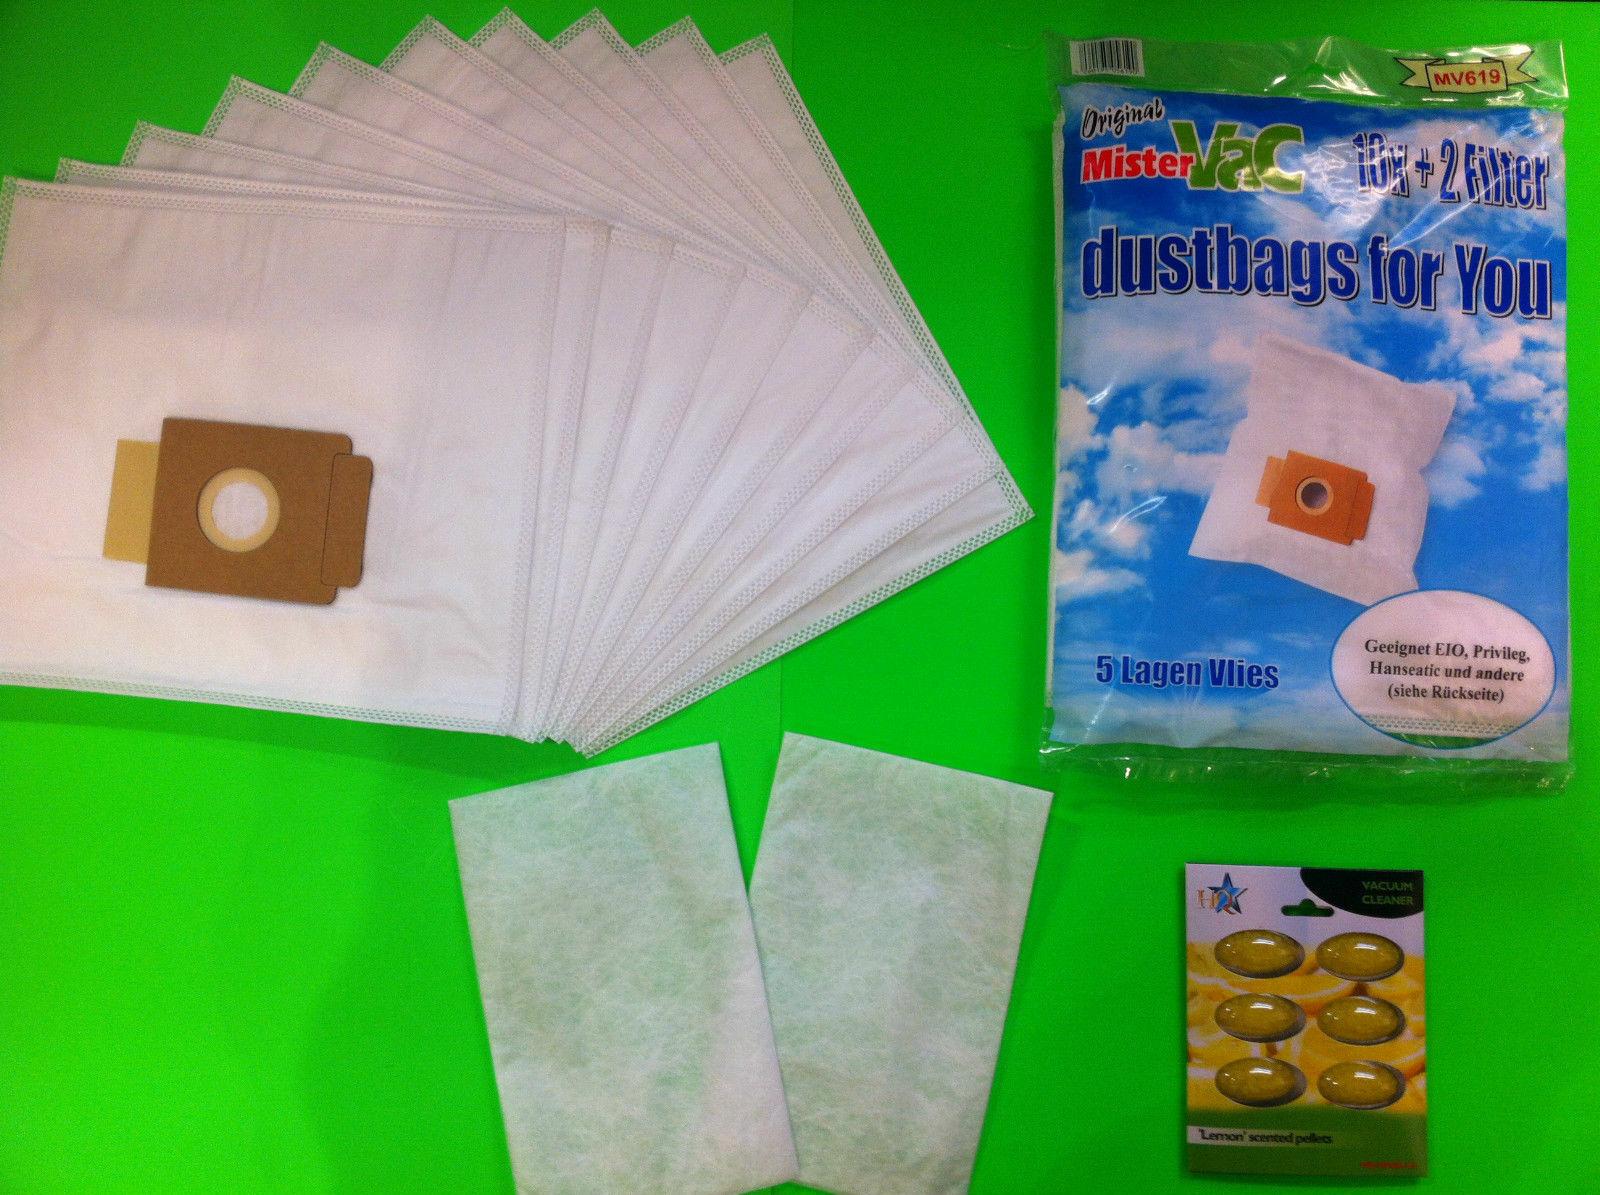 10 sacs pour aspirateur rotel u64.4 u64.5 u65.9 Filtre sacs